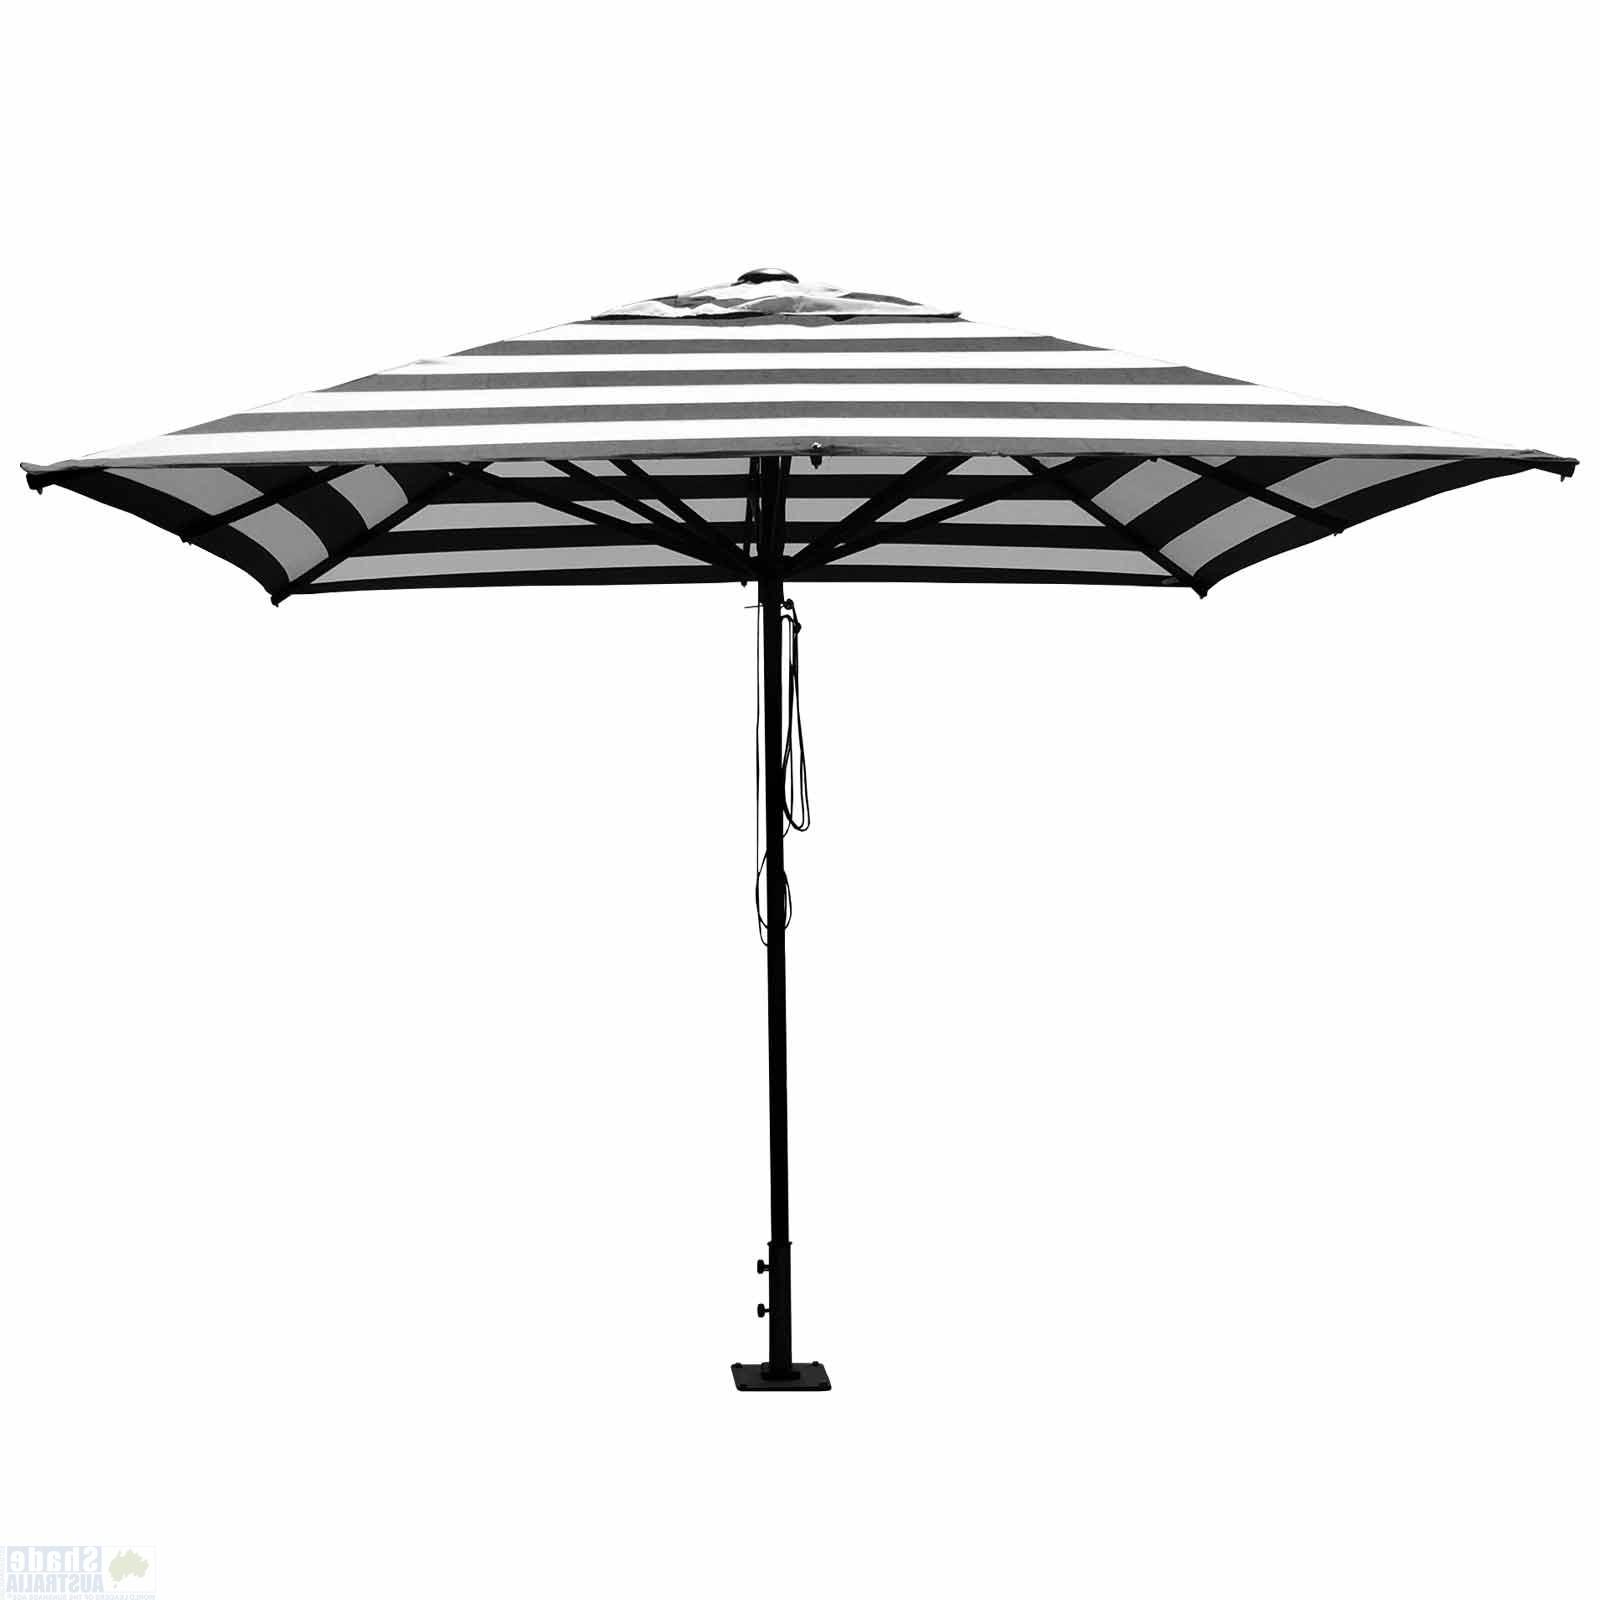 "Market Umbrellas Intended For Well Known Sunranger ""soho"" Market Umbrella (Gallery 1 of 20)"